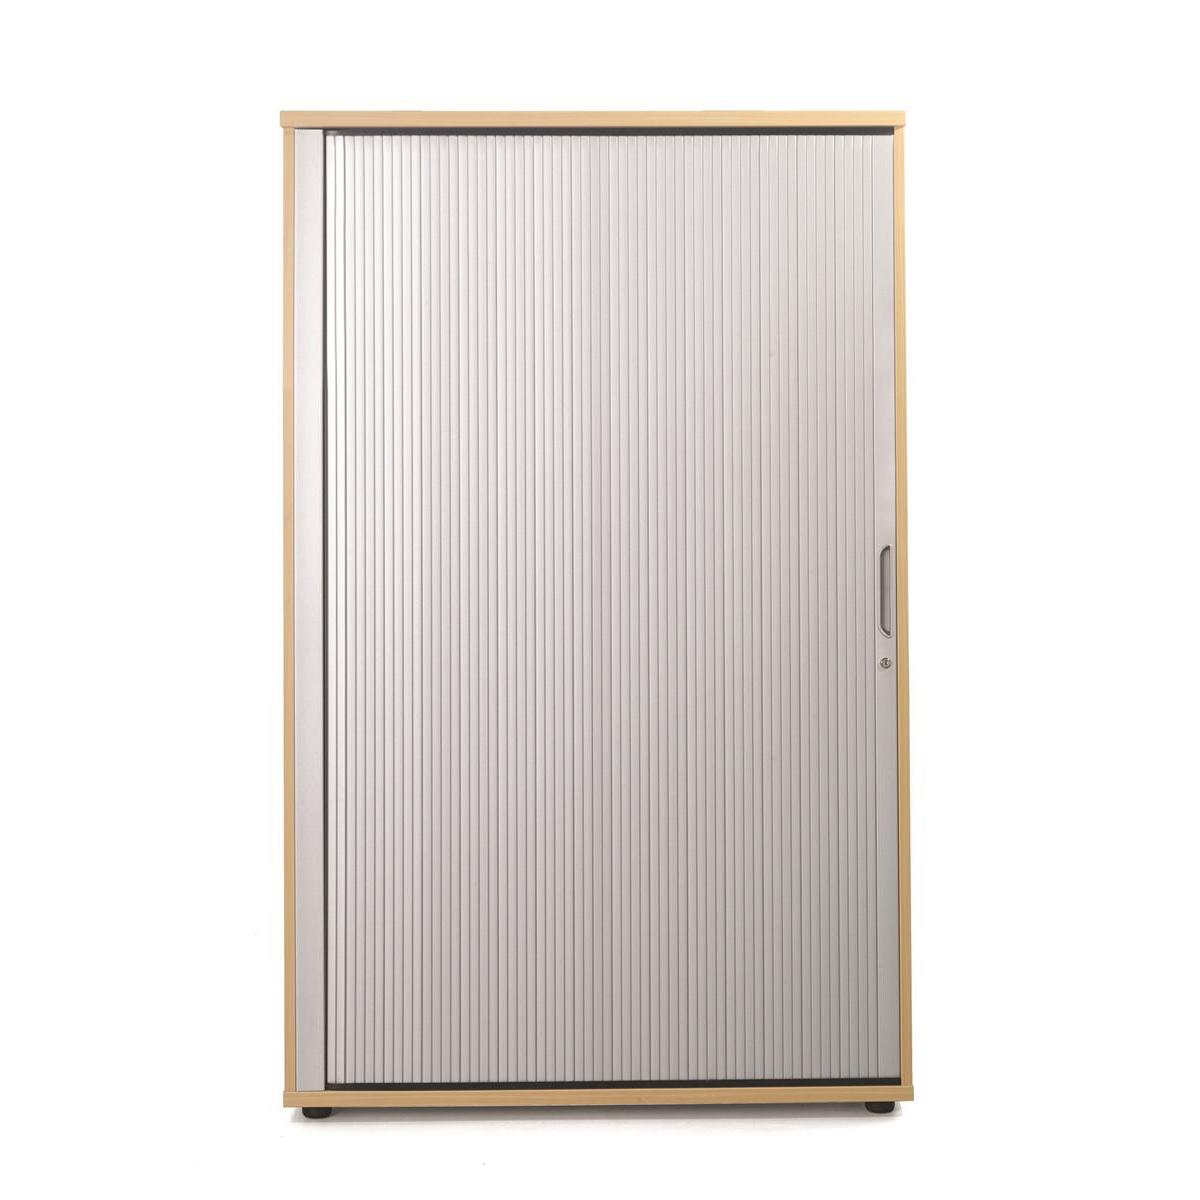 Sonix Medium Tambour Door Cupboard 1000x525x1600mm 1 Shelf Rich Beech/Silver Ref w9870b